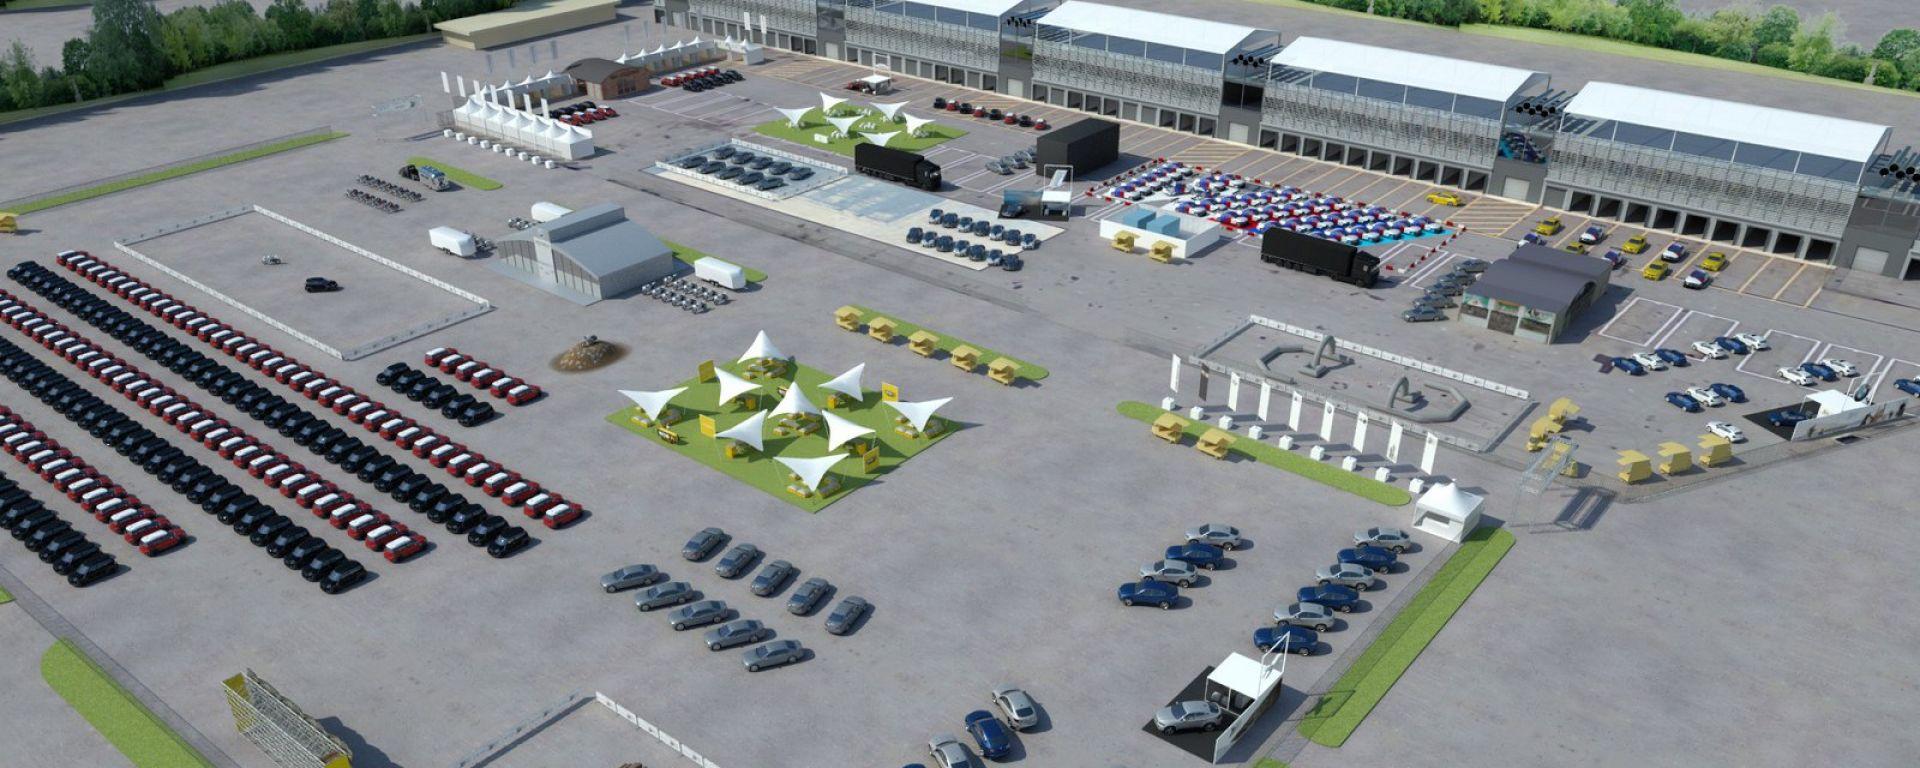 BMW Next 100 Festival: a Monza la Woodstock dei motori